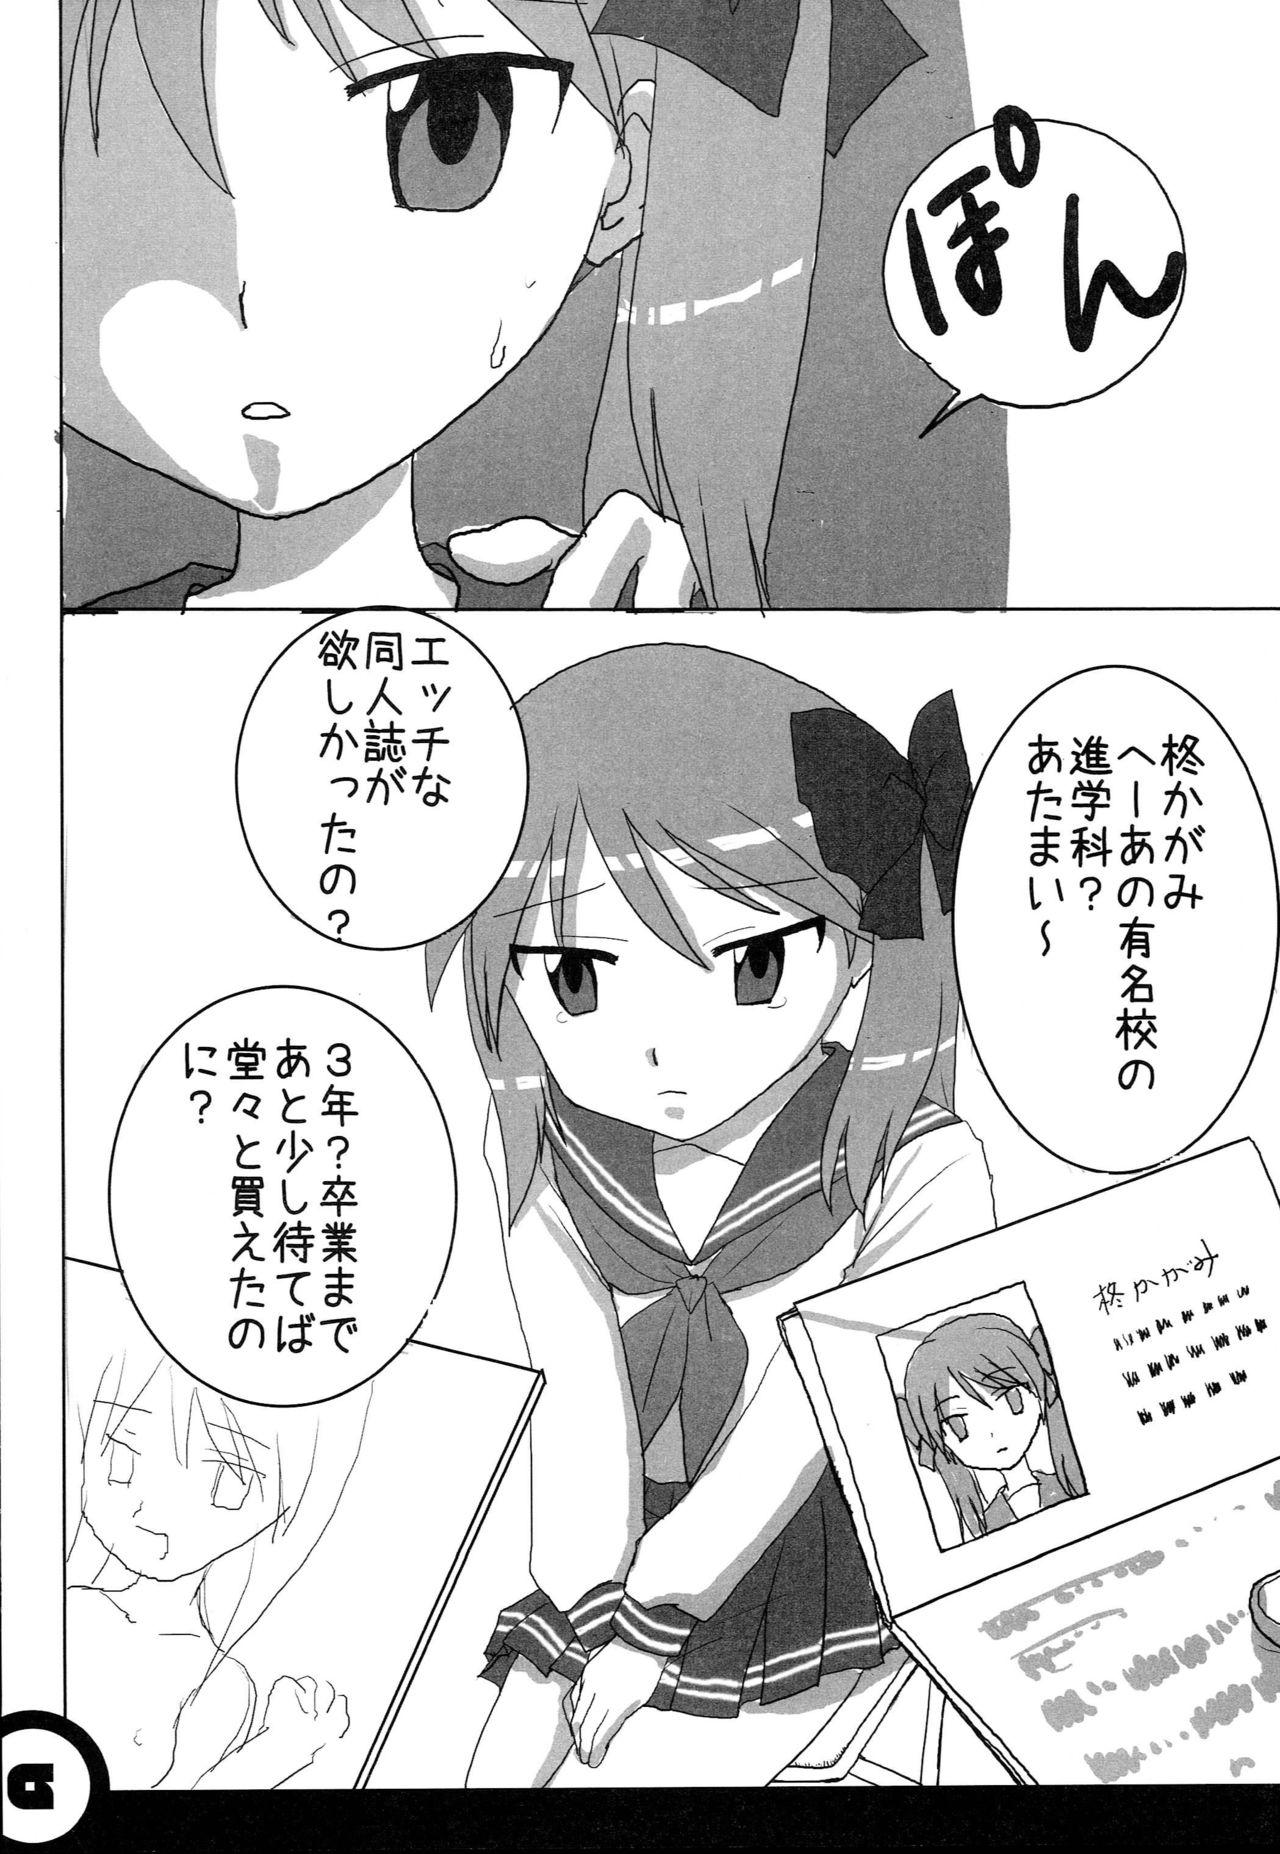 Himitsu no Kagamin 5